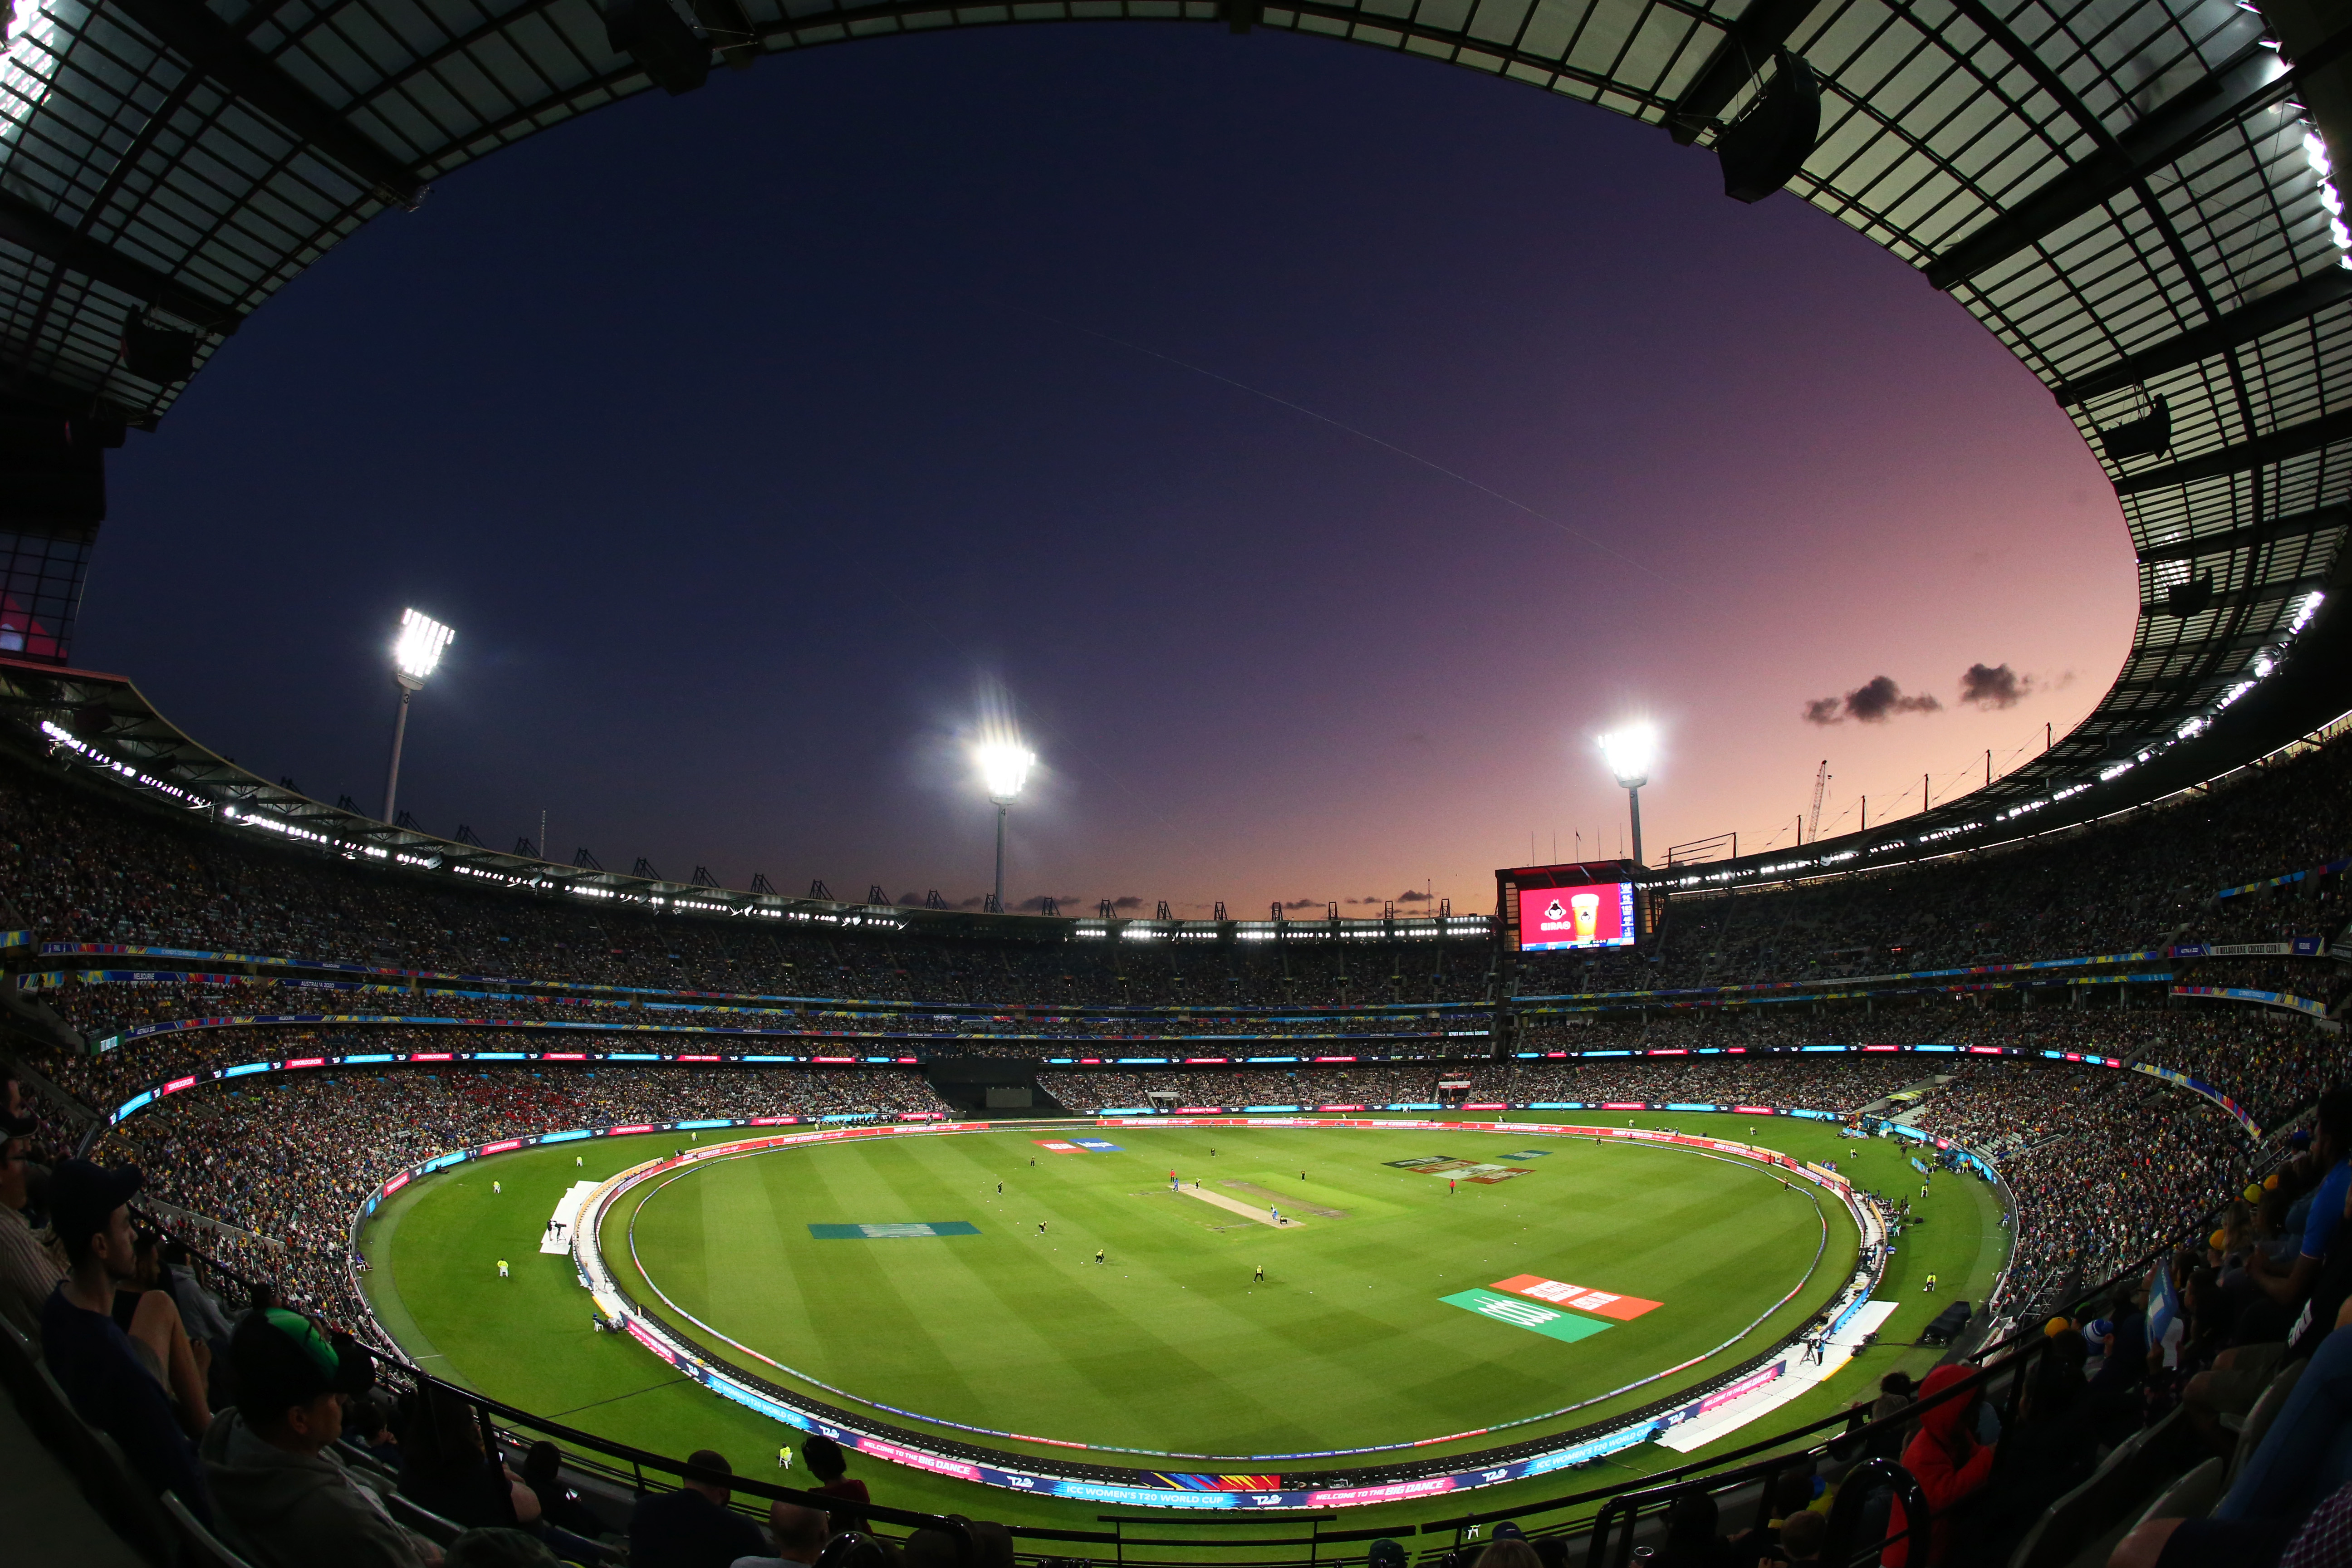 Venue for postponed 2020 ICC Men's T20 World Cup confirmed